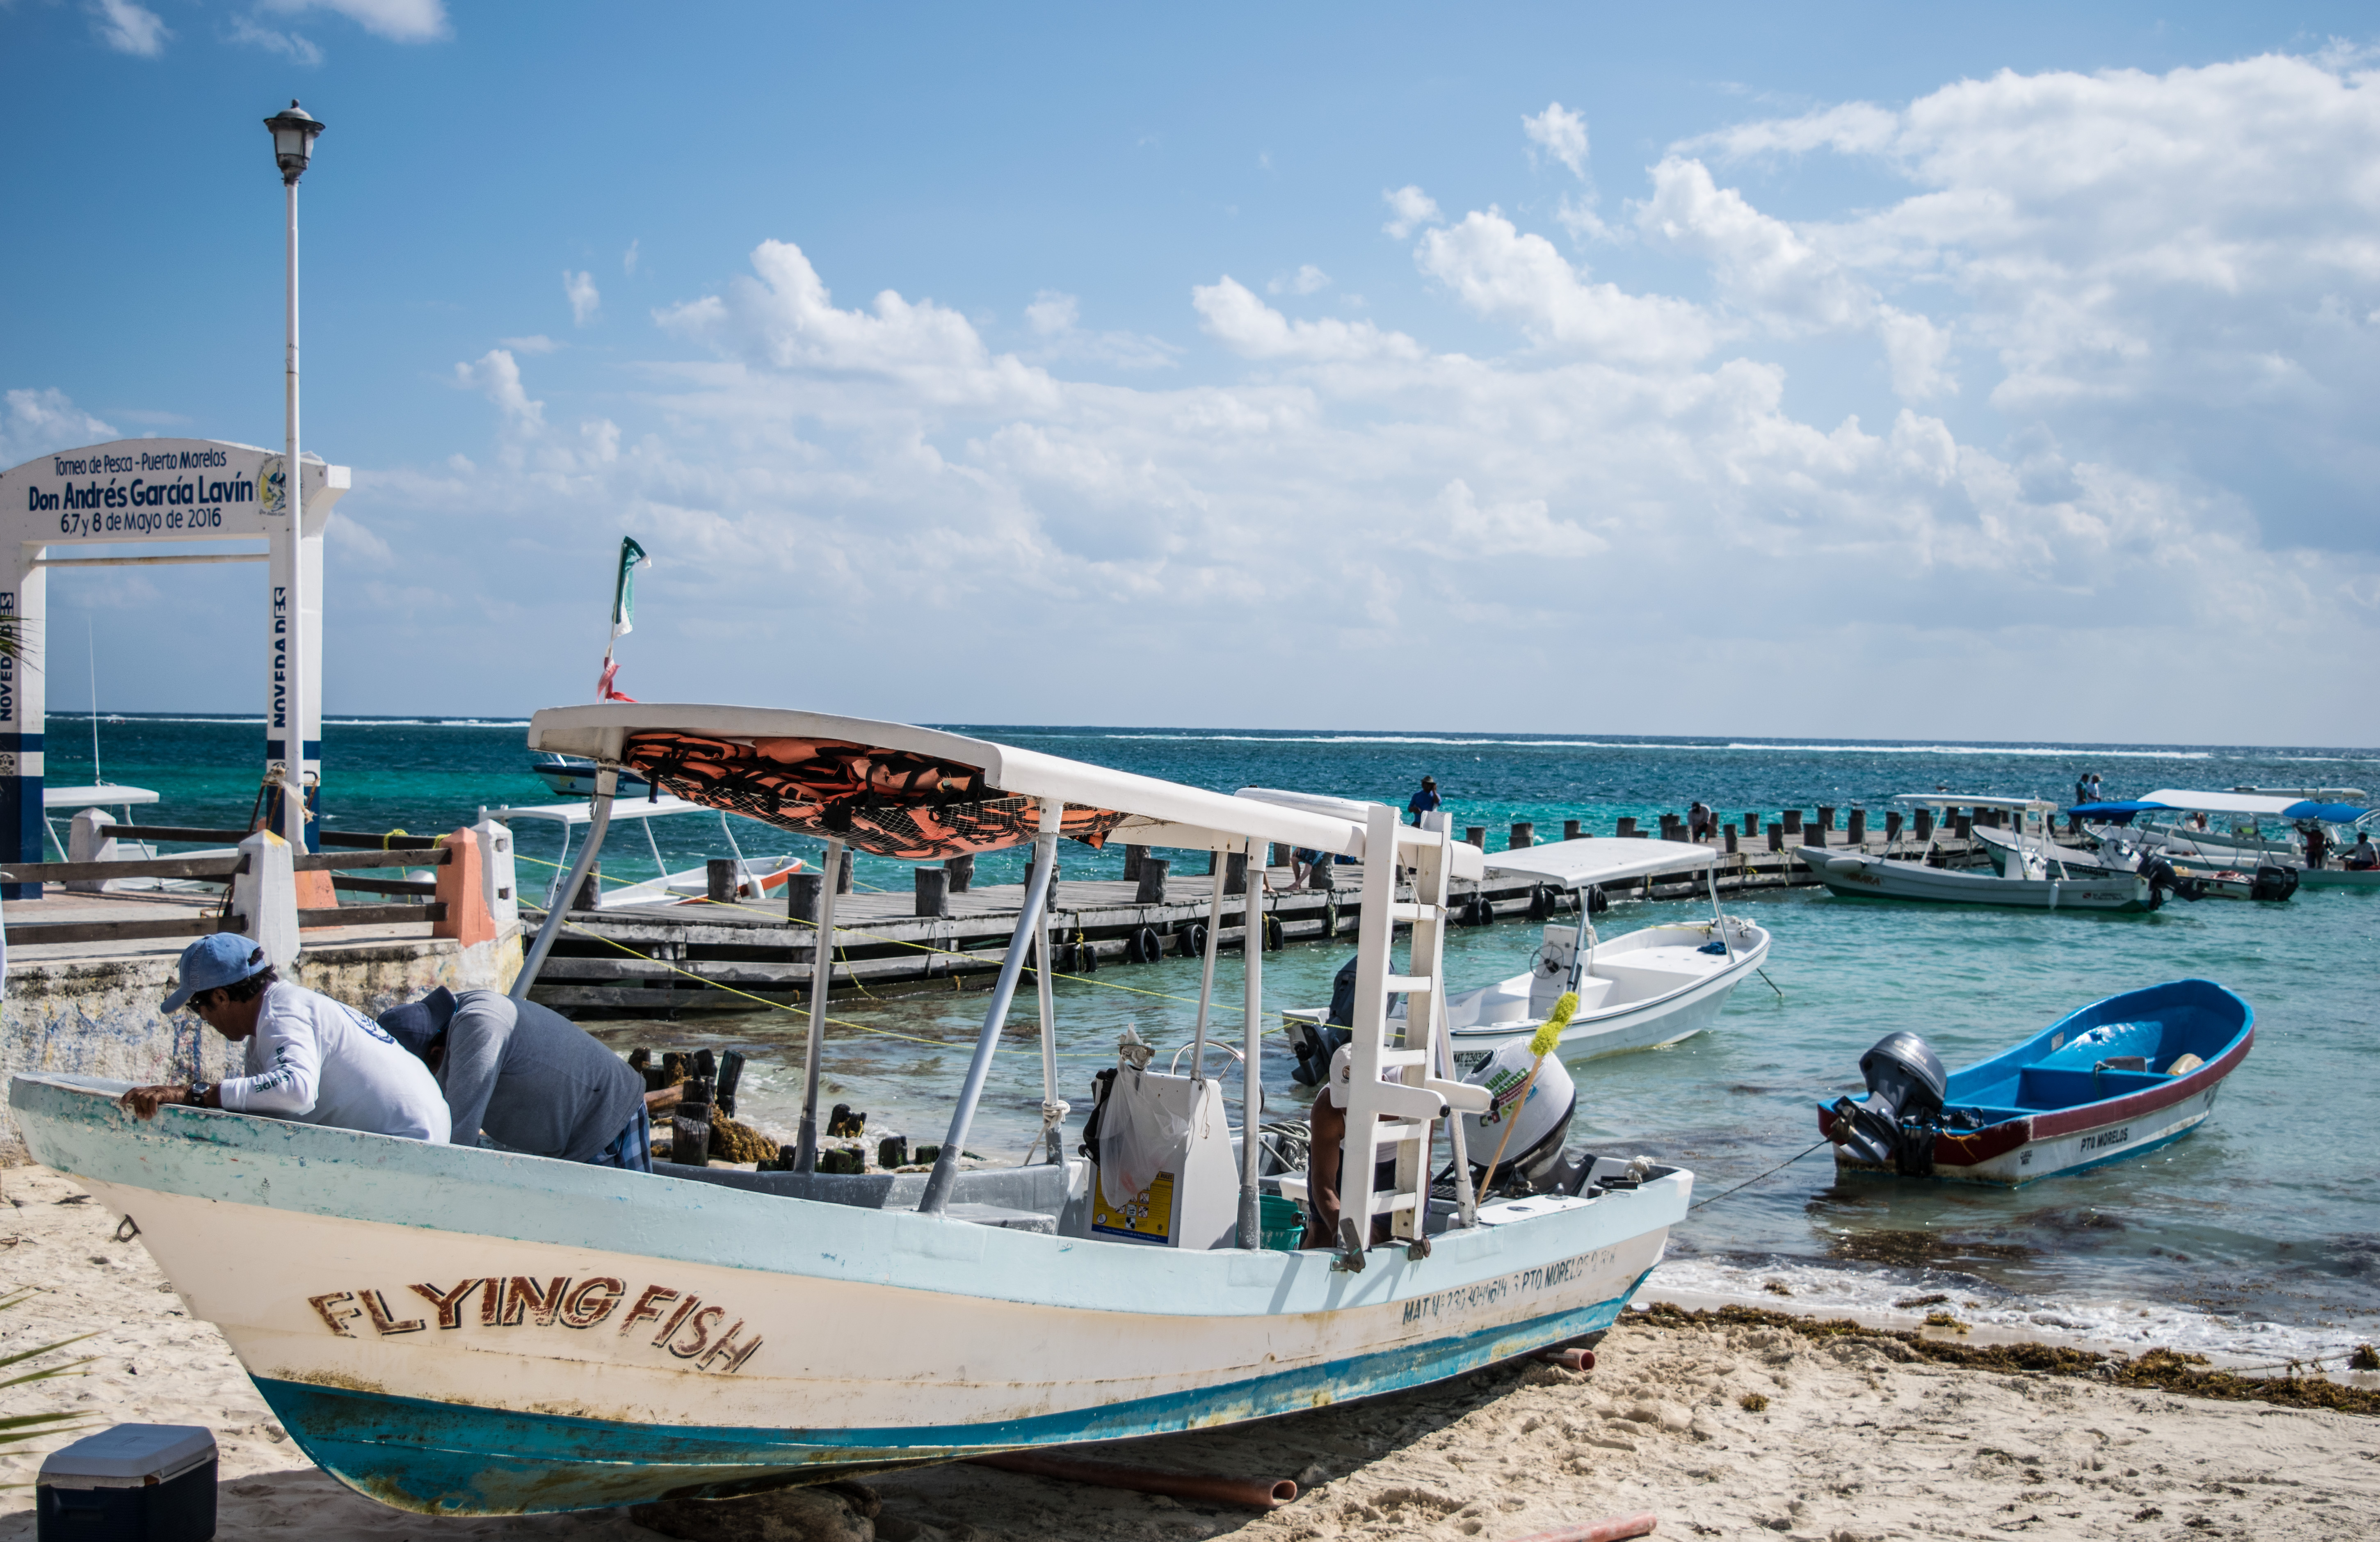 boat and docks in Puerto Morelos